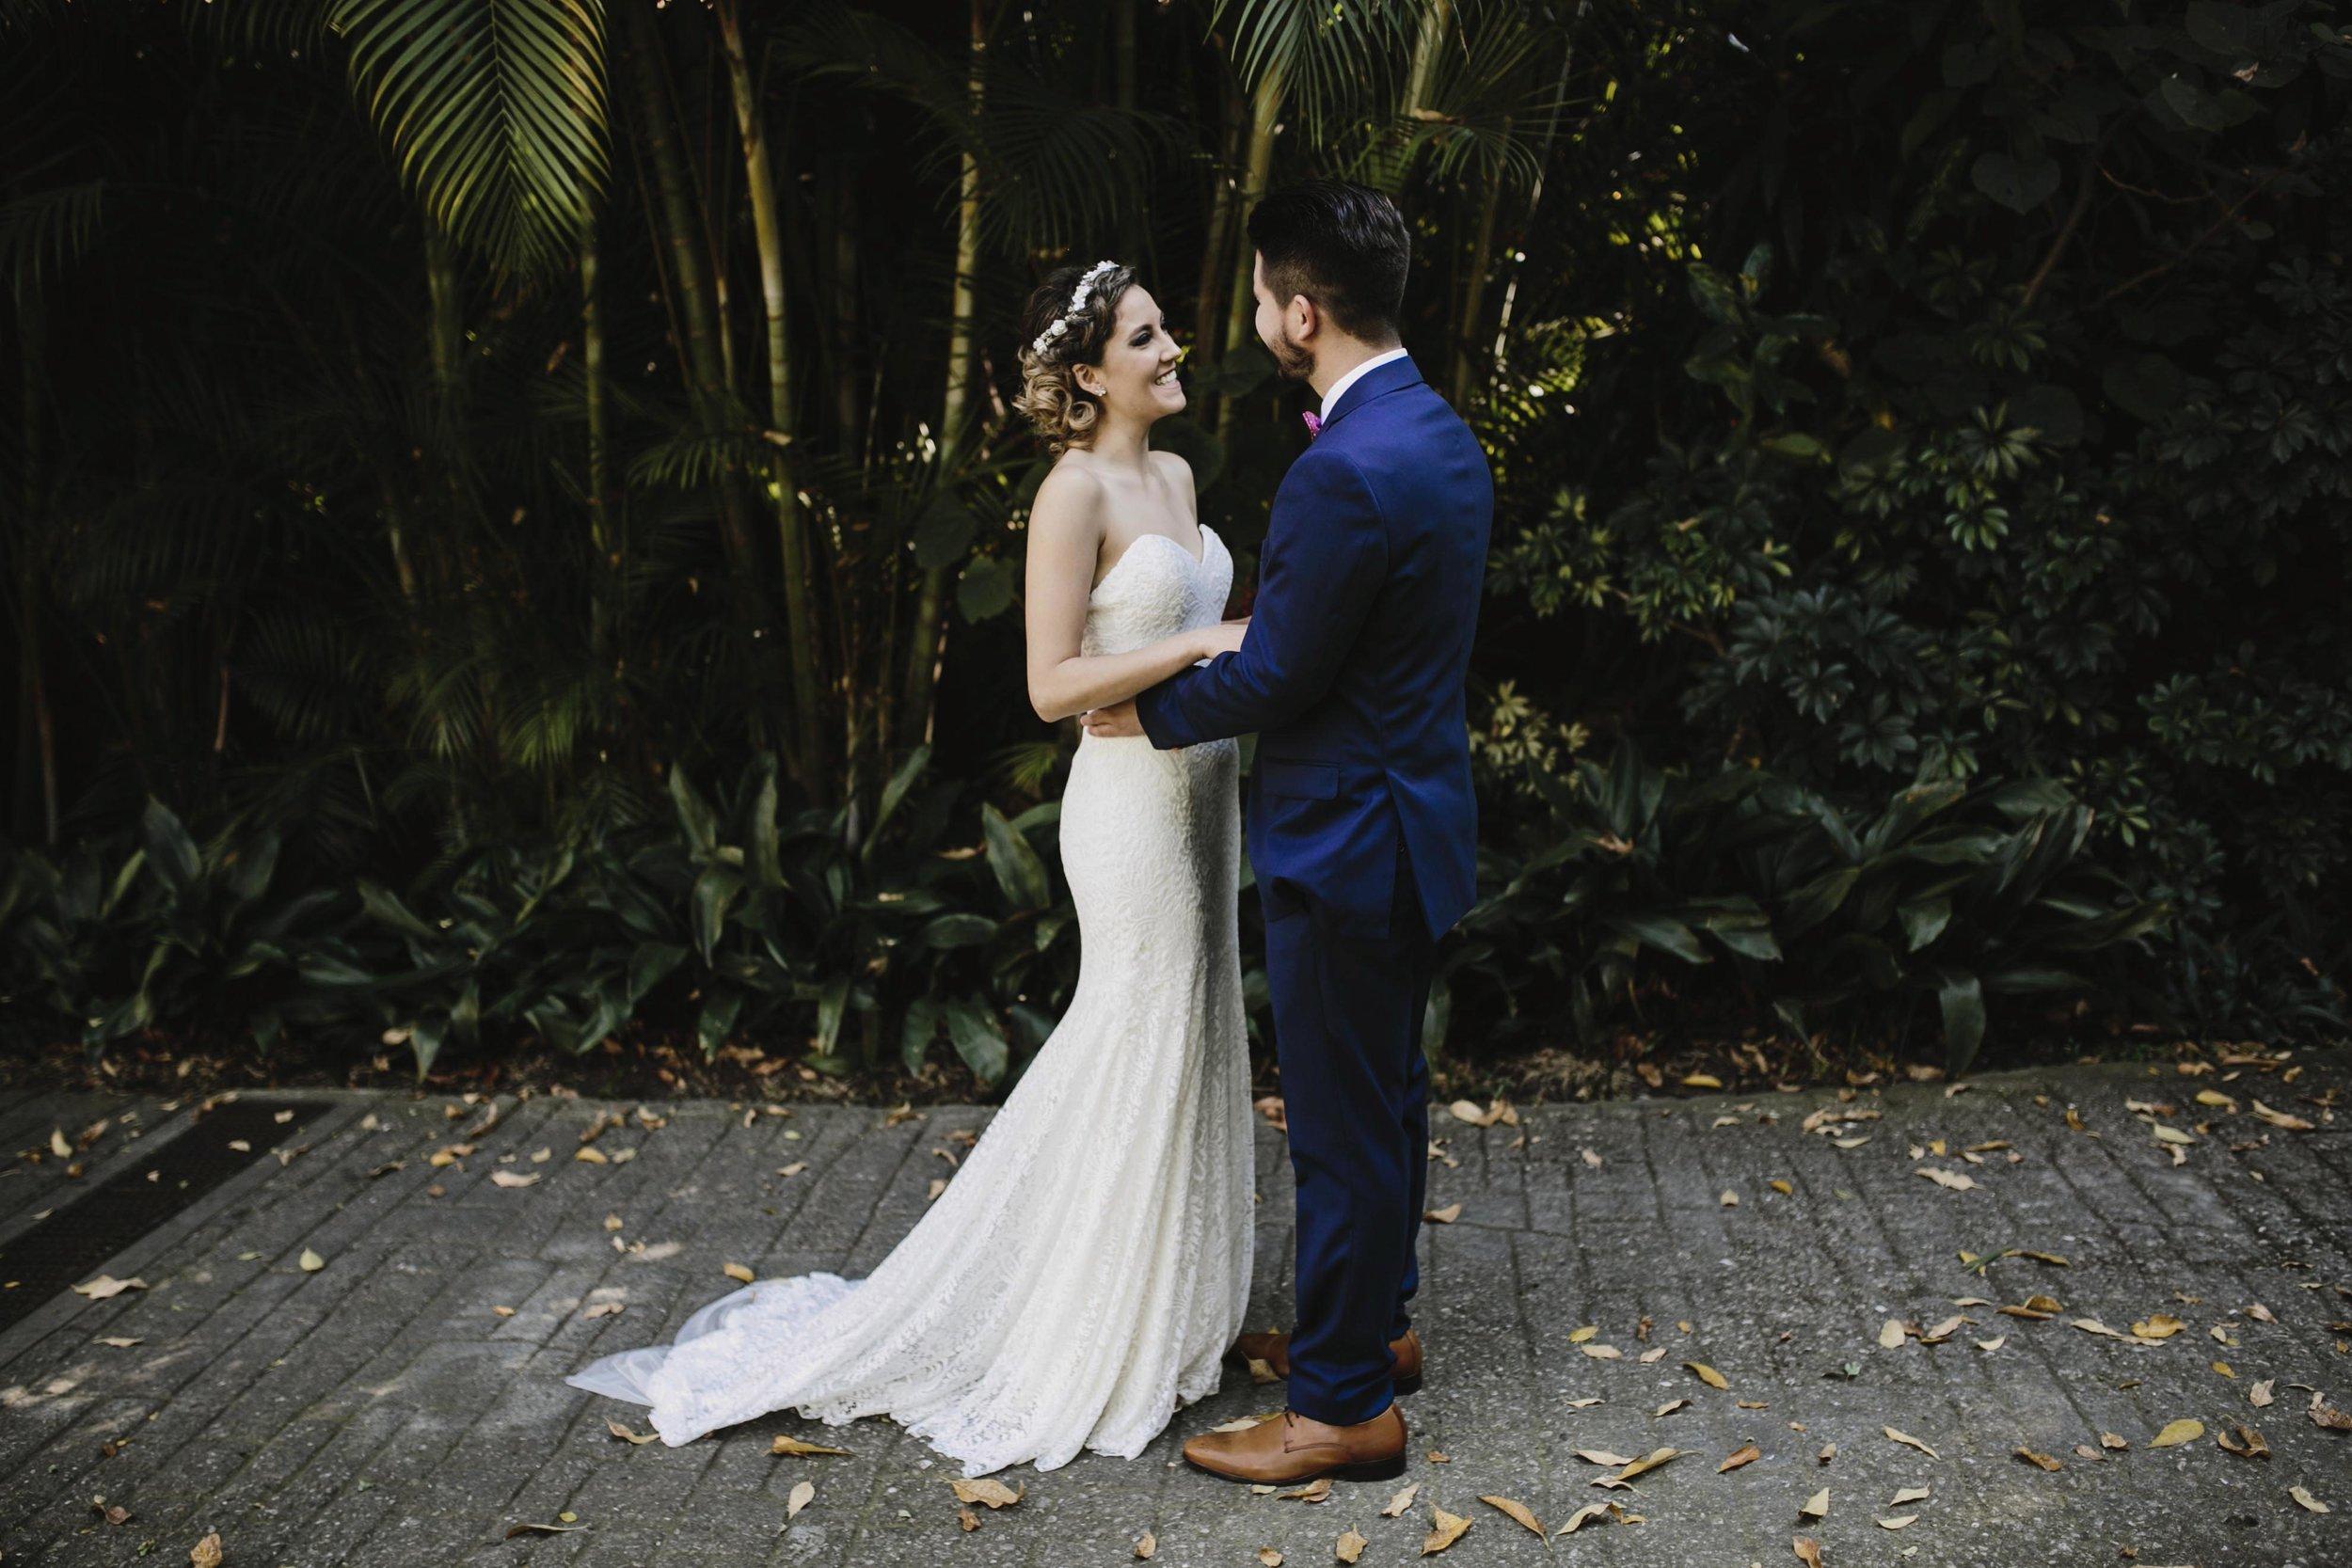 alfonso_flores_destination_wedding_photography_jardin_amarello_cuernavaca45.jpg